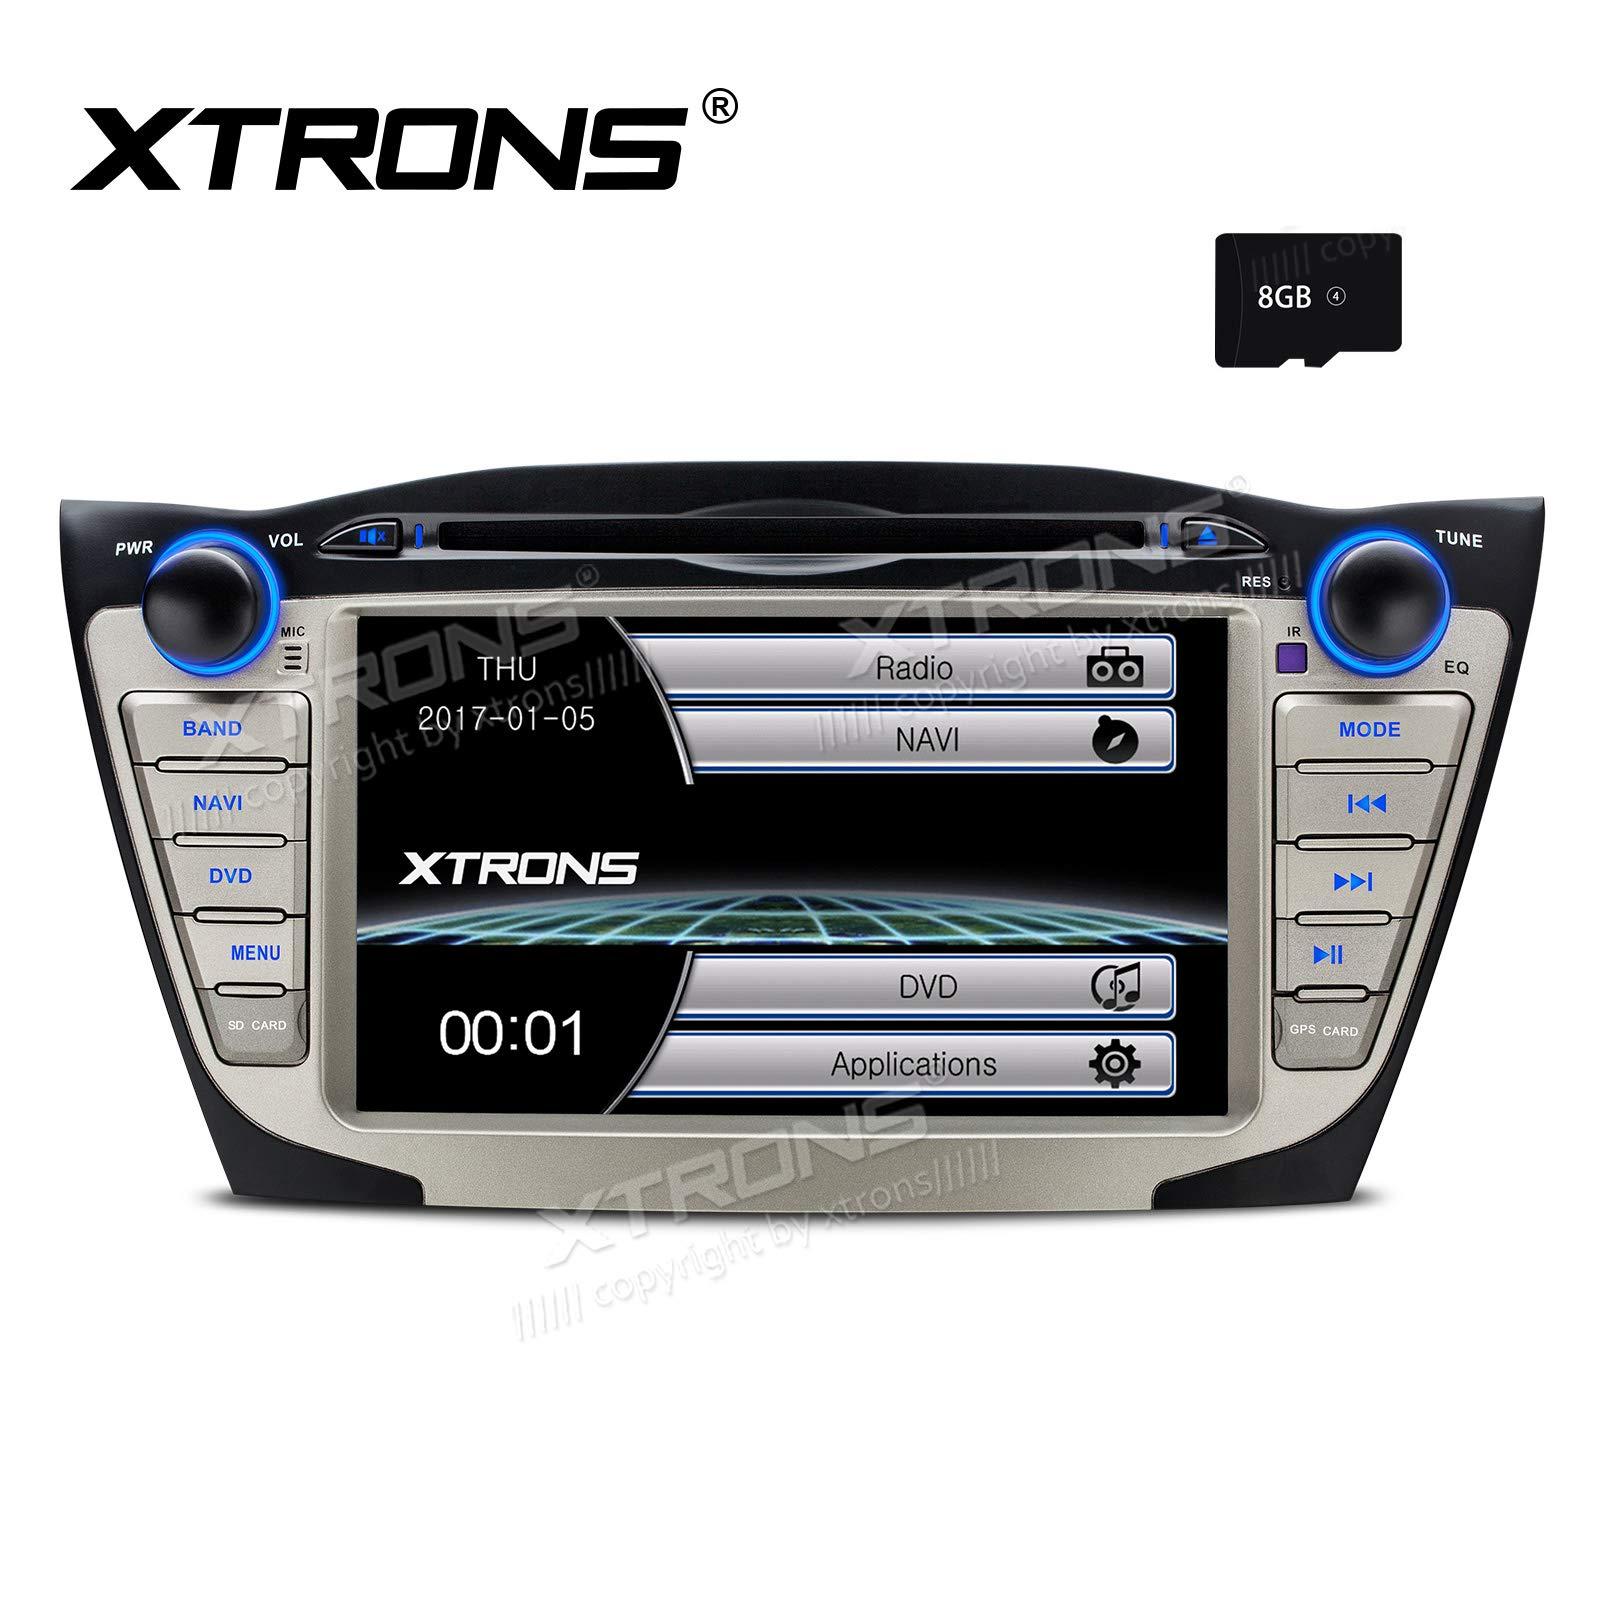 XTRONS 7 Inch HD Digital Touch Screen Car Stereo Radio in-Dash DVD Player GPS Navigation Screen Mirroring Function for Hyundai Tucson ix35 by XTRONS